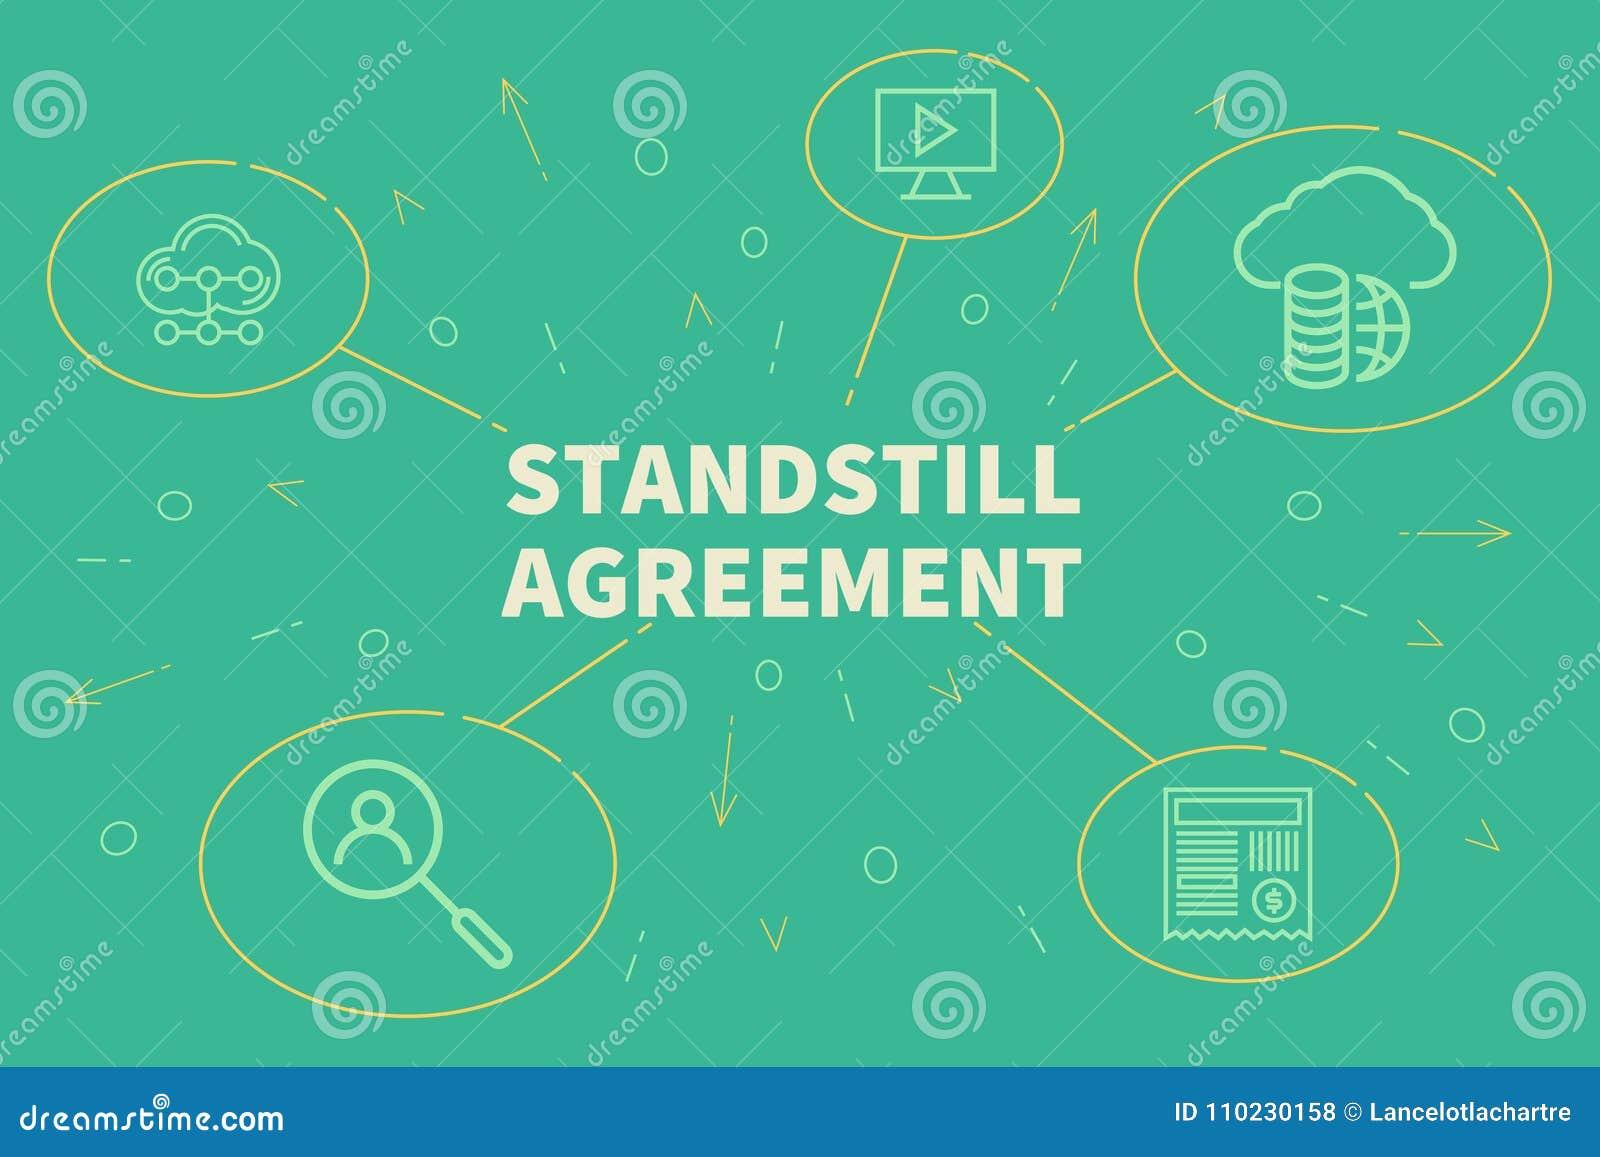 business illustration showing the concept of standstill agreemen